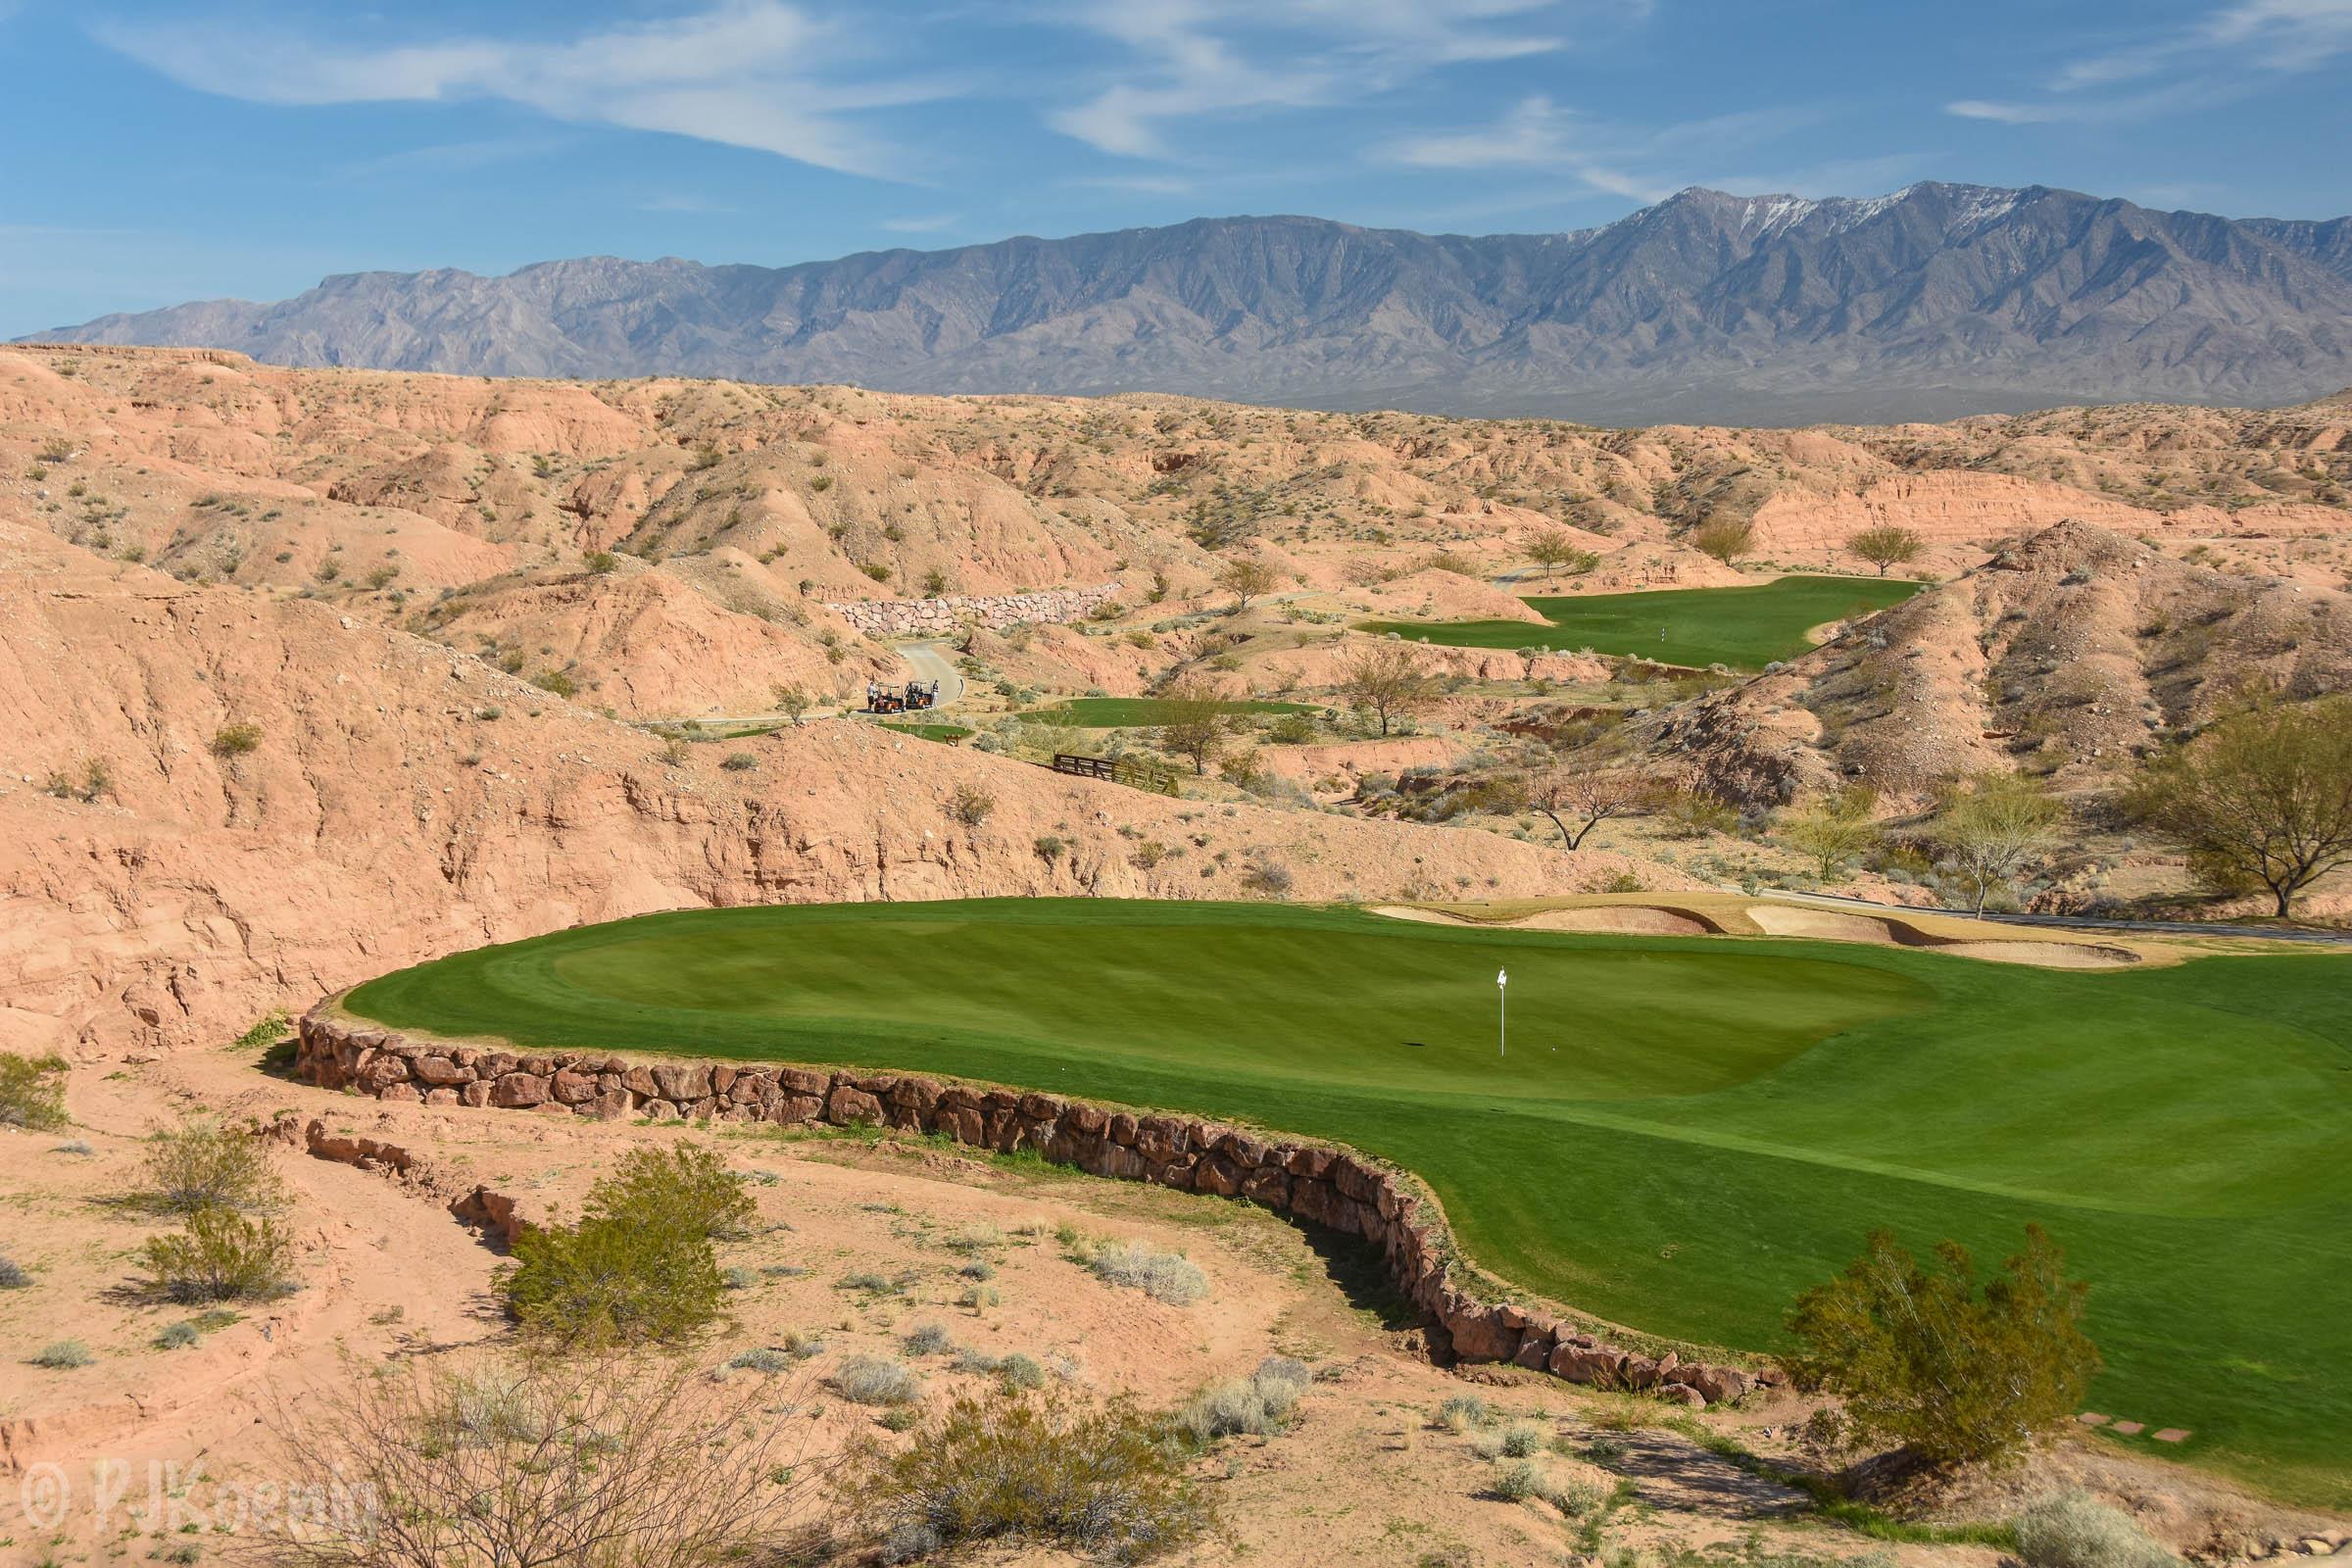 Conestoga Golf Club - Mesquite, NV